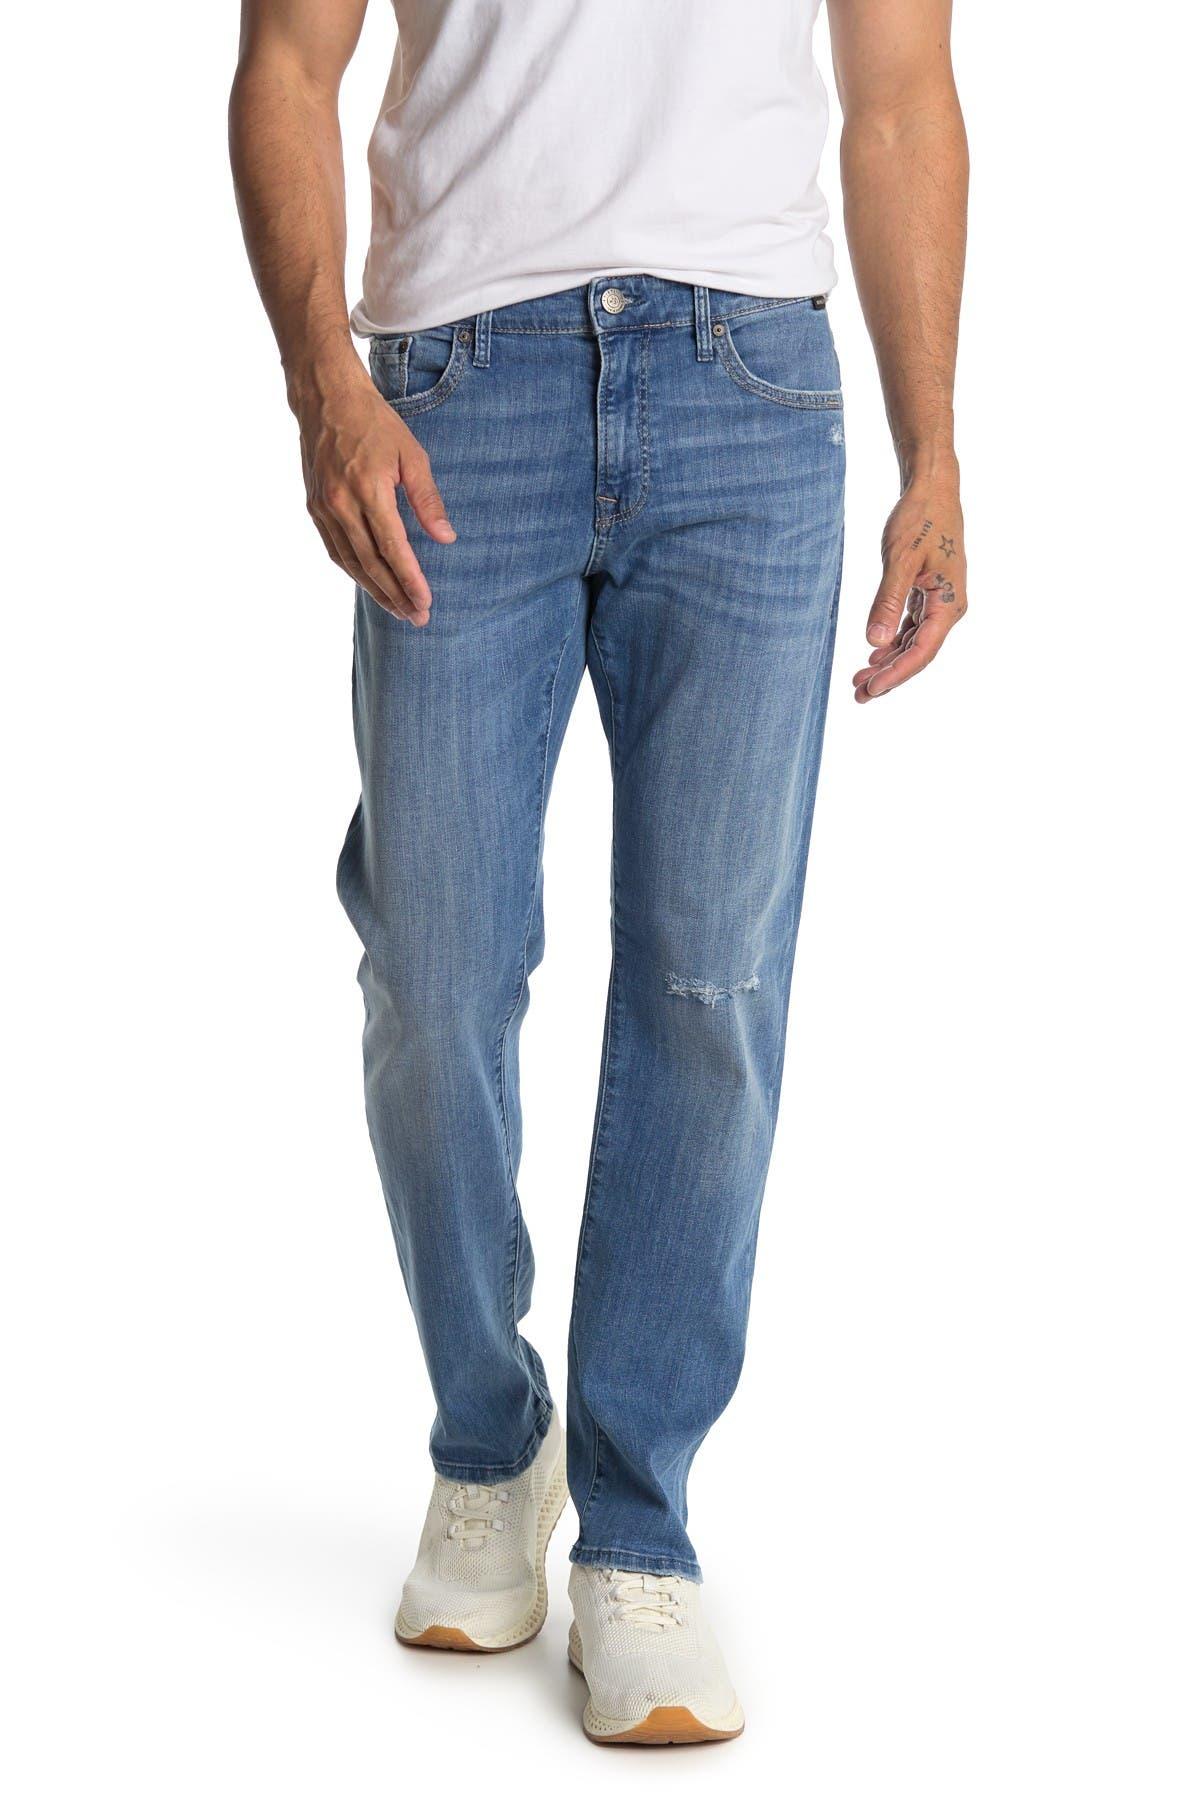 Image of Mavi Zach Indigo Ripped Knee Jeans